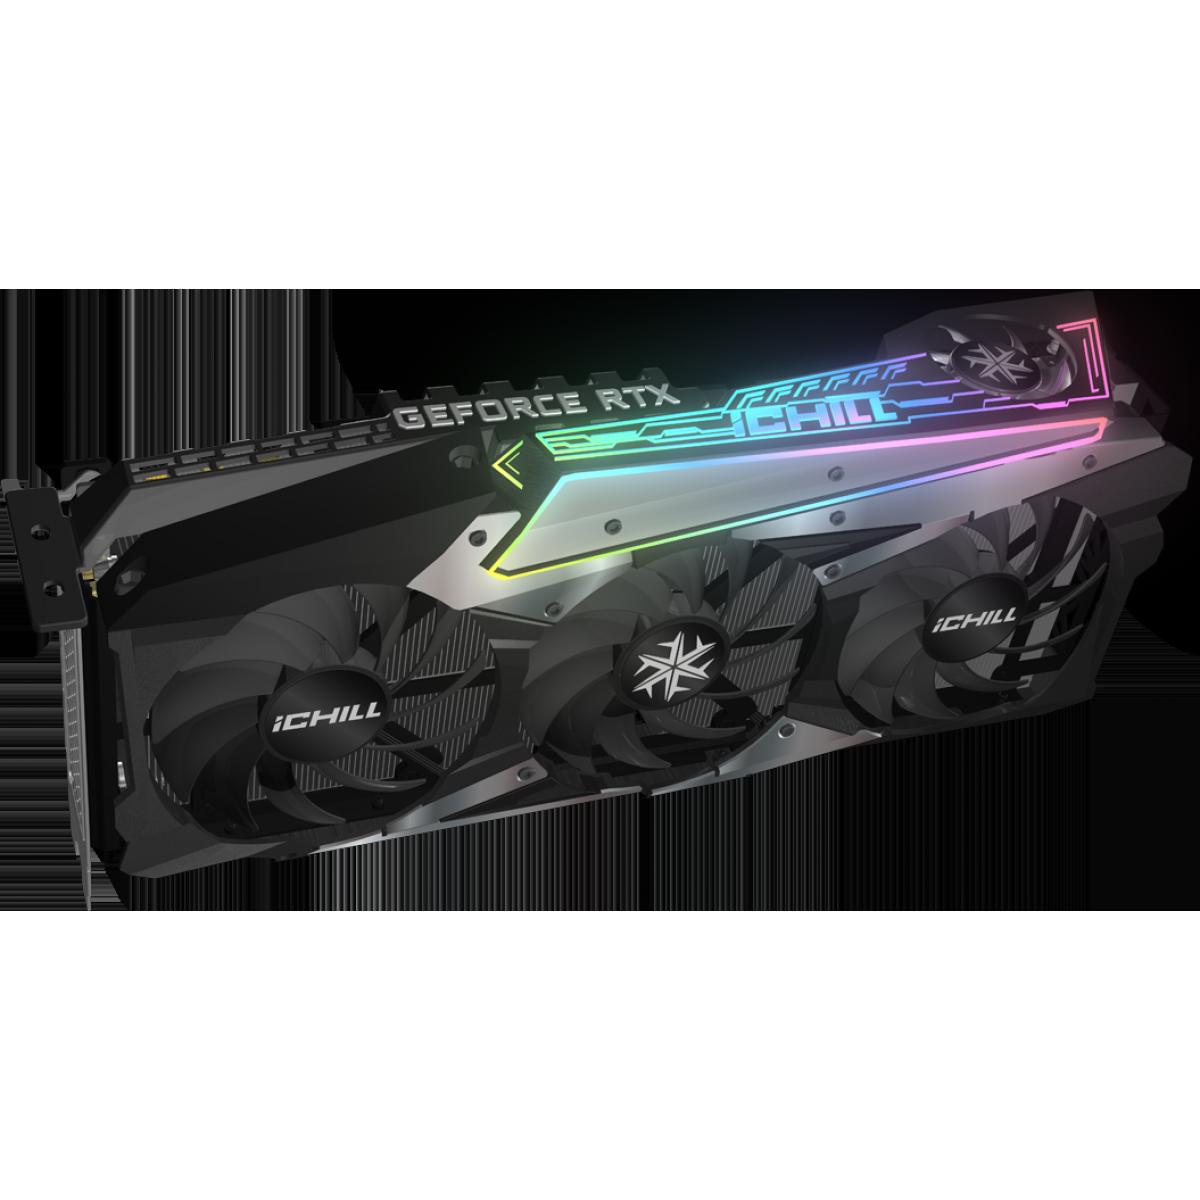 Placa de Vídeo INNO3D Geforce, ICHILL X4, RTX 3080, 10GB, GDDR6X, 320bit, C30804-106XX-1810VA36